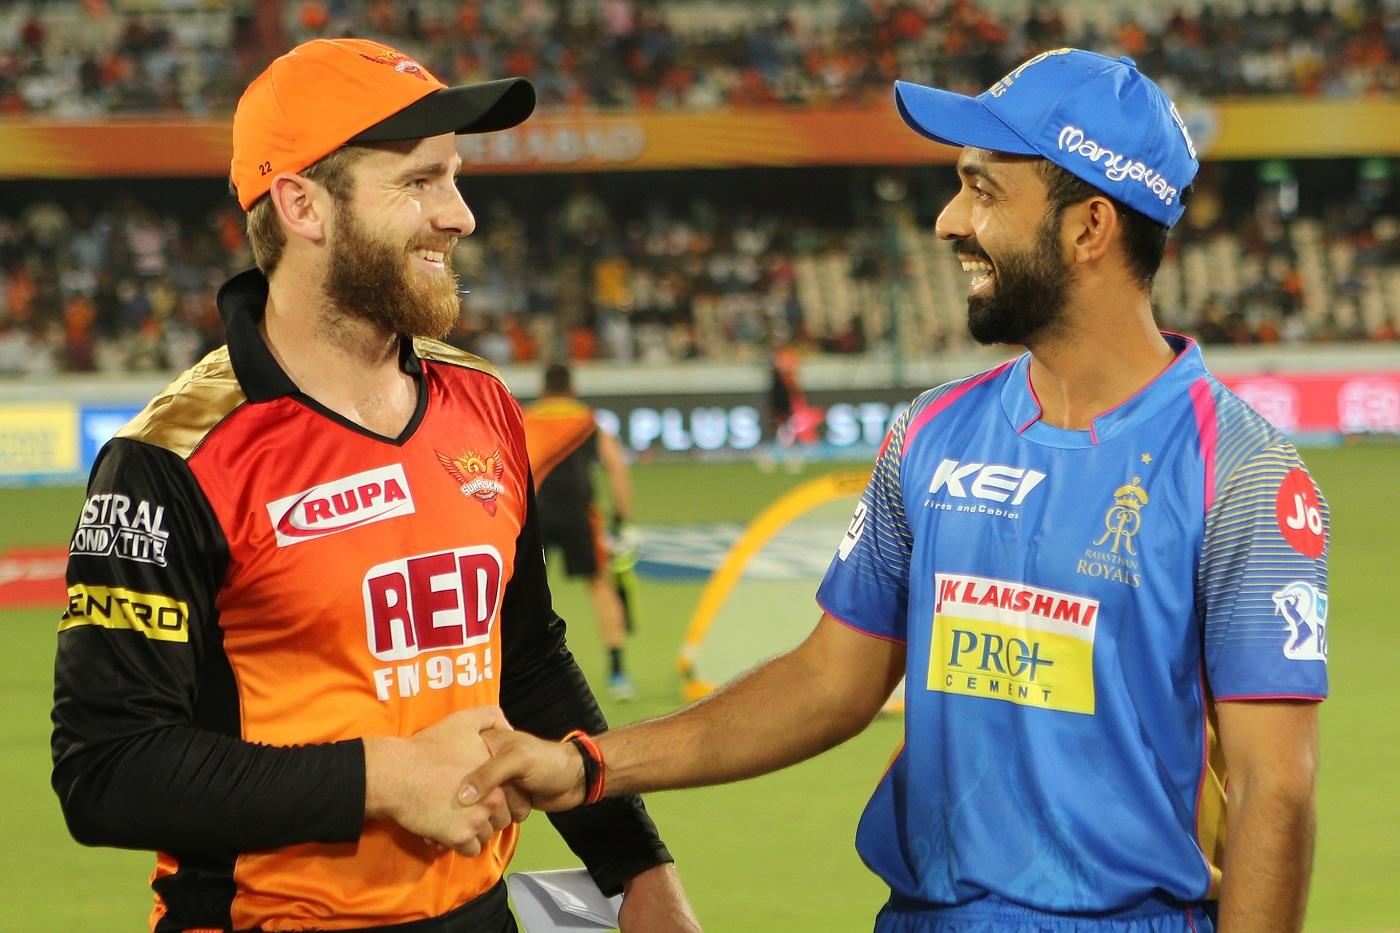 SRH vs RR IPL 2018 MATCH No 4